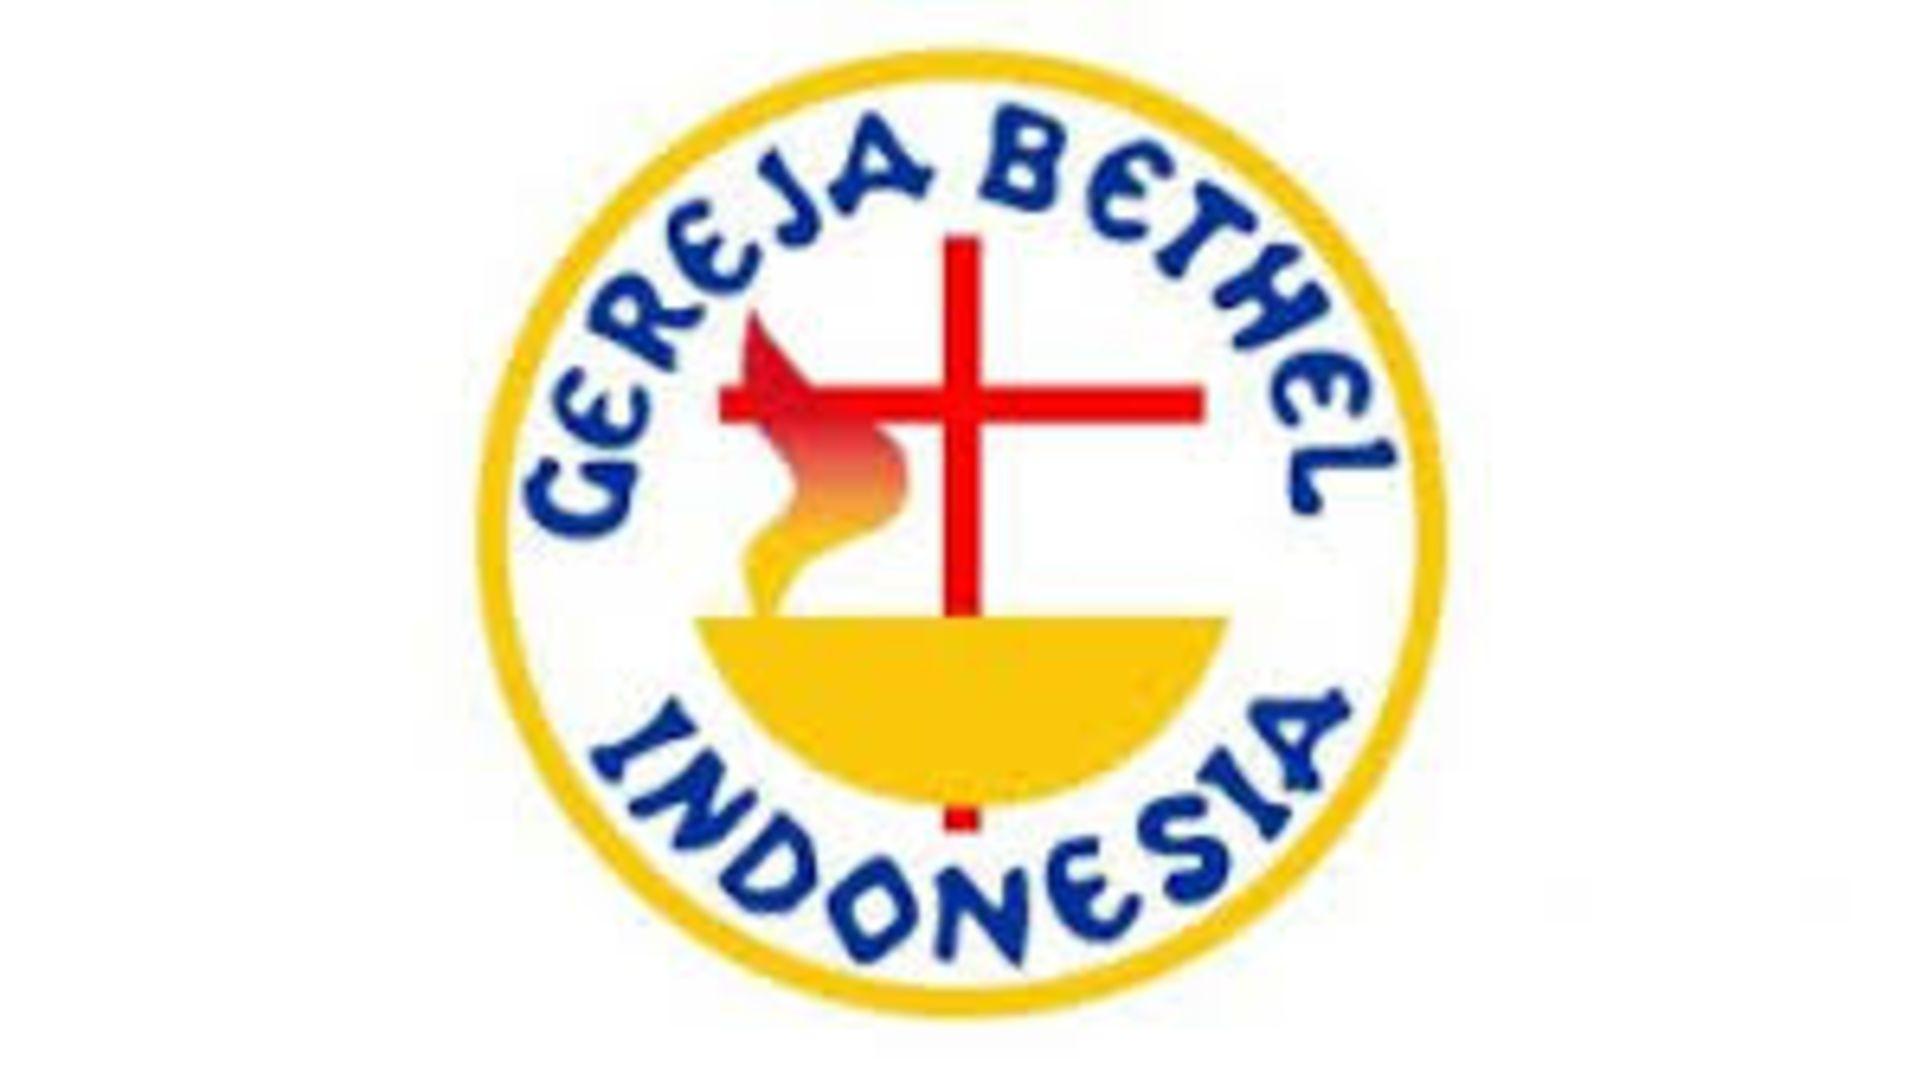 GBI (Gereja Bethel Indonesia)